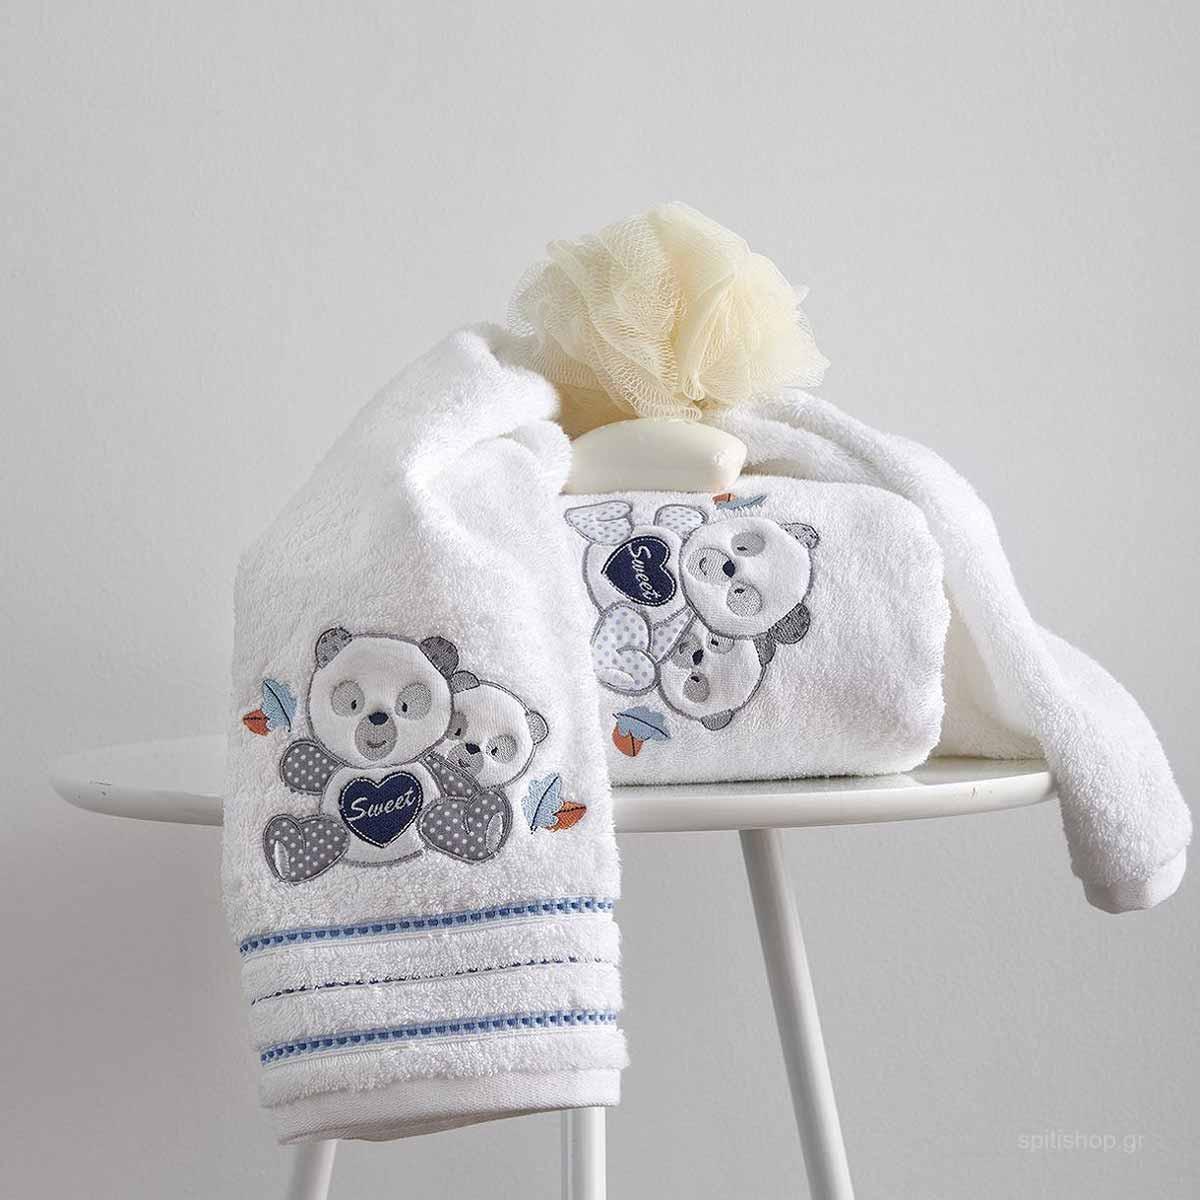 b53b6b7f49a -44% Spiti Shop Βρεφικές Πετσέτες (Σετ 2τμχ) Sb Home Baby Panda Blue